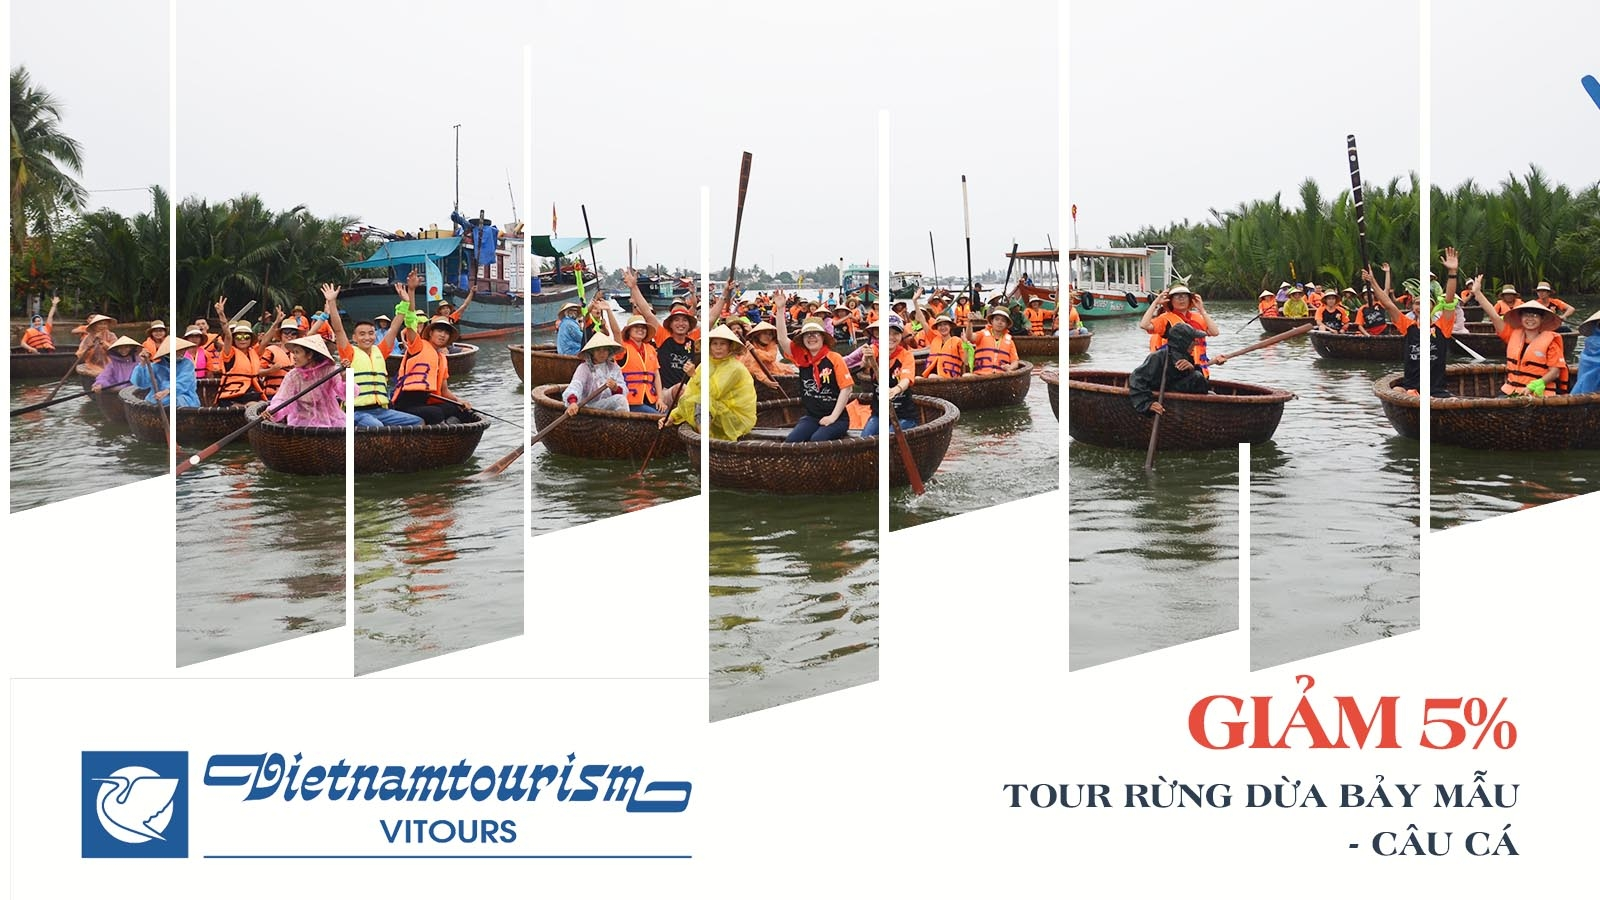 Vitours giảm 5% Tour Rừng dừa Bảy Mẫu - Câu cá 2